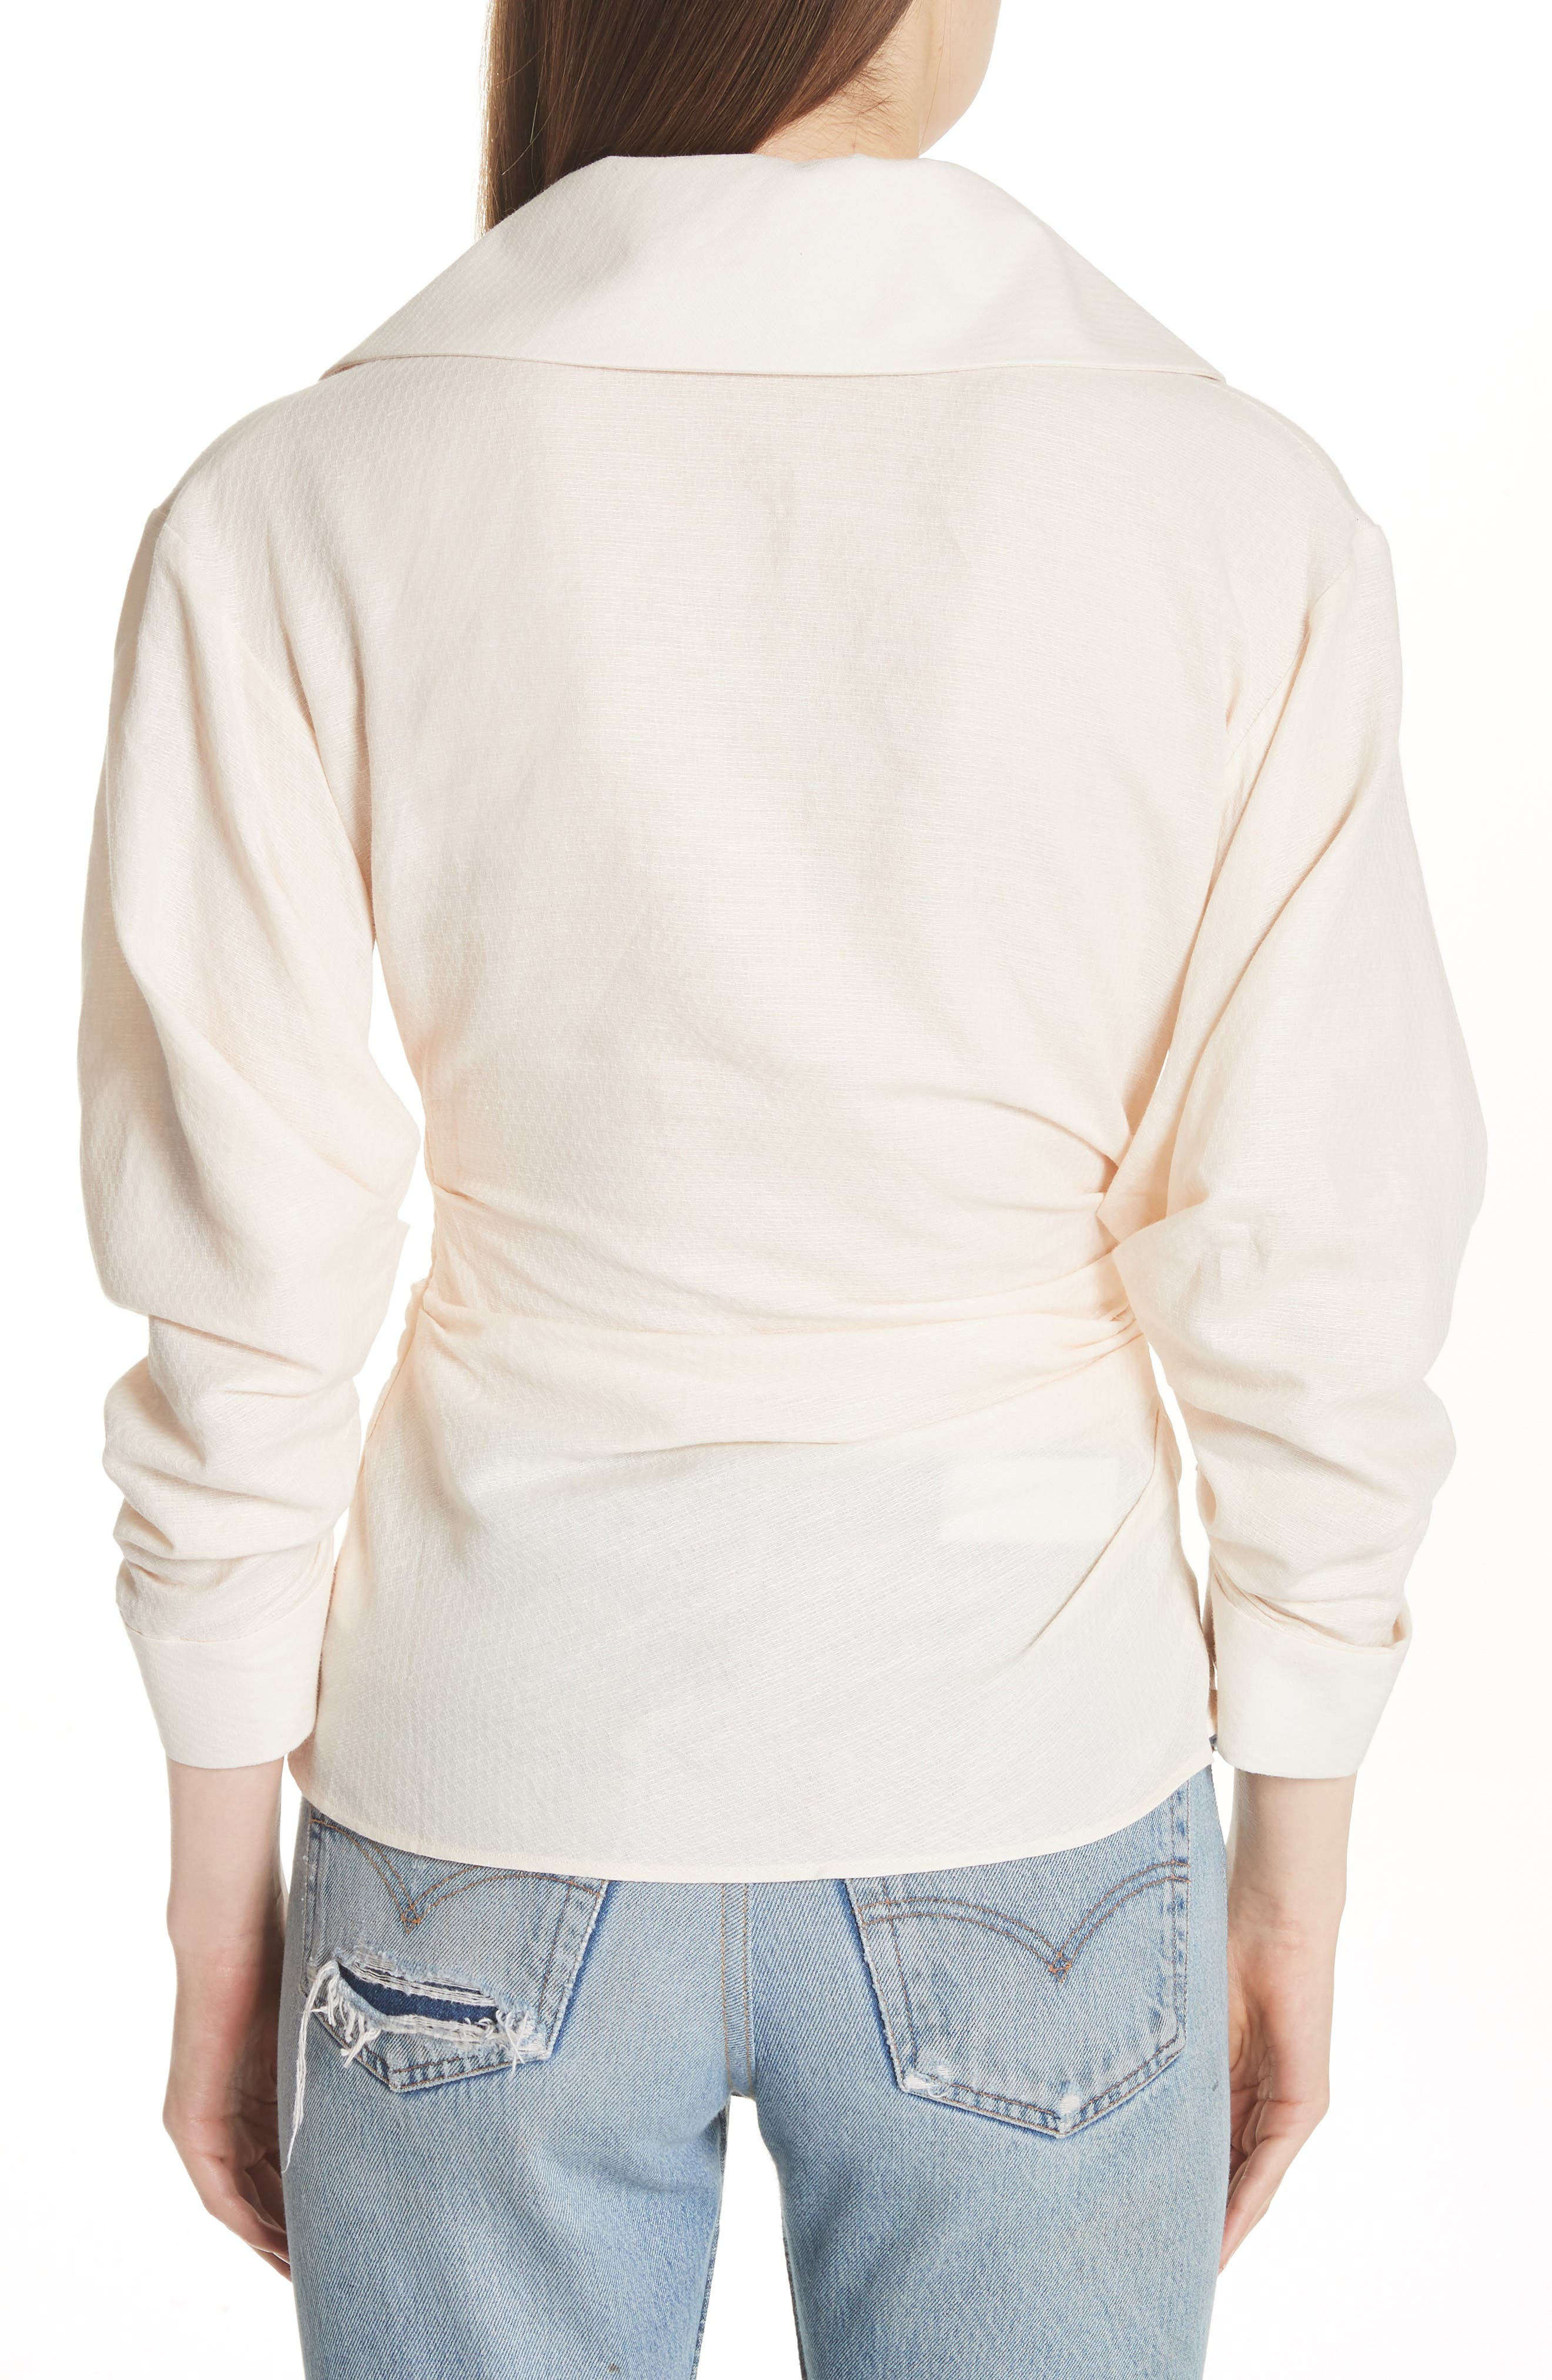 La Chemise Maceio Shirt,                             Alternate thumbnail 2, color,                             250